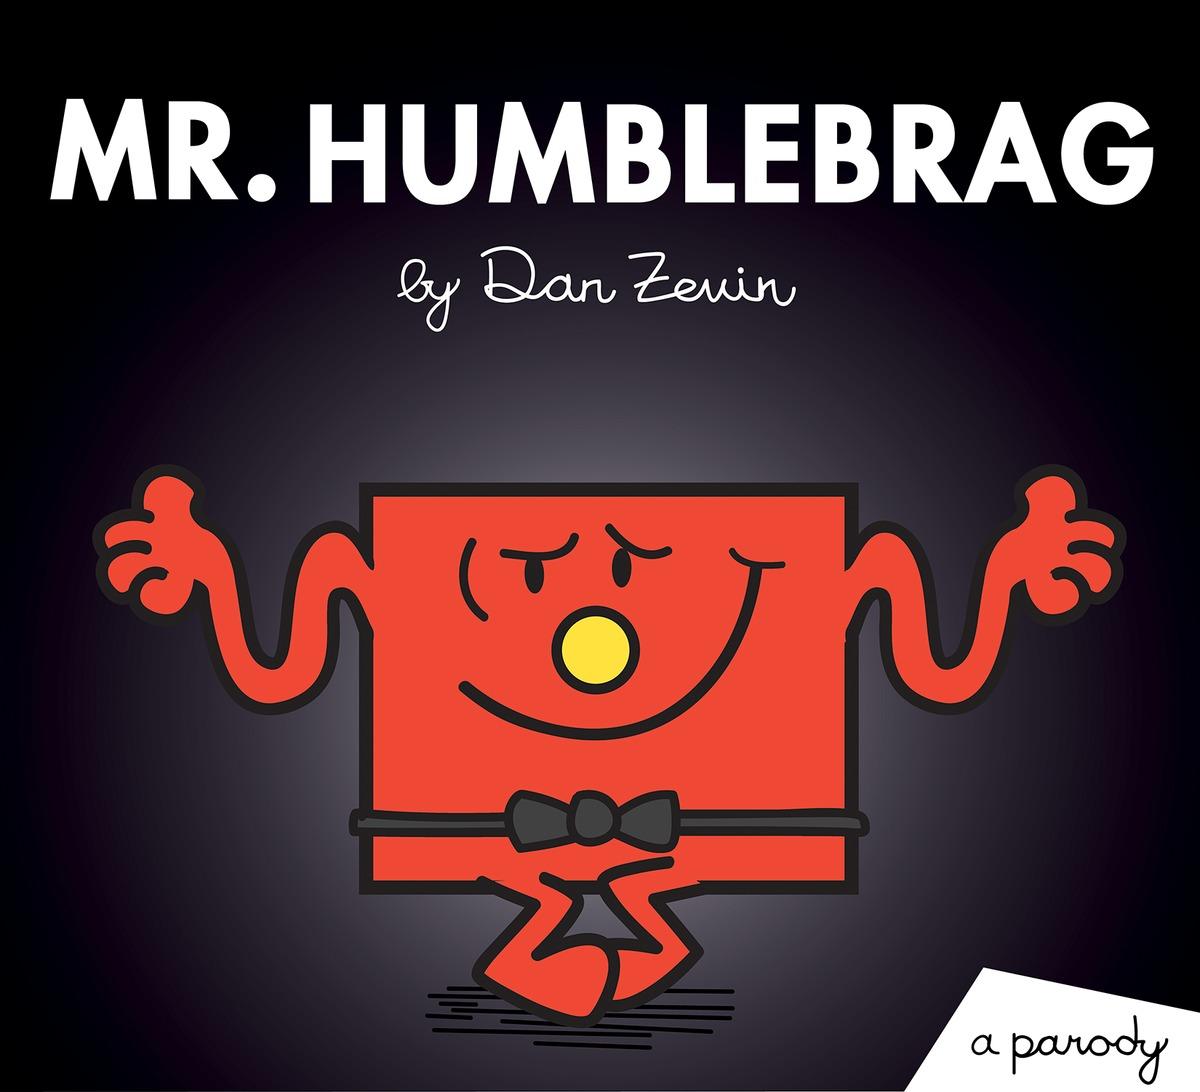 MR. HUMBLEBRAG the little man